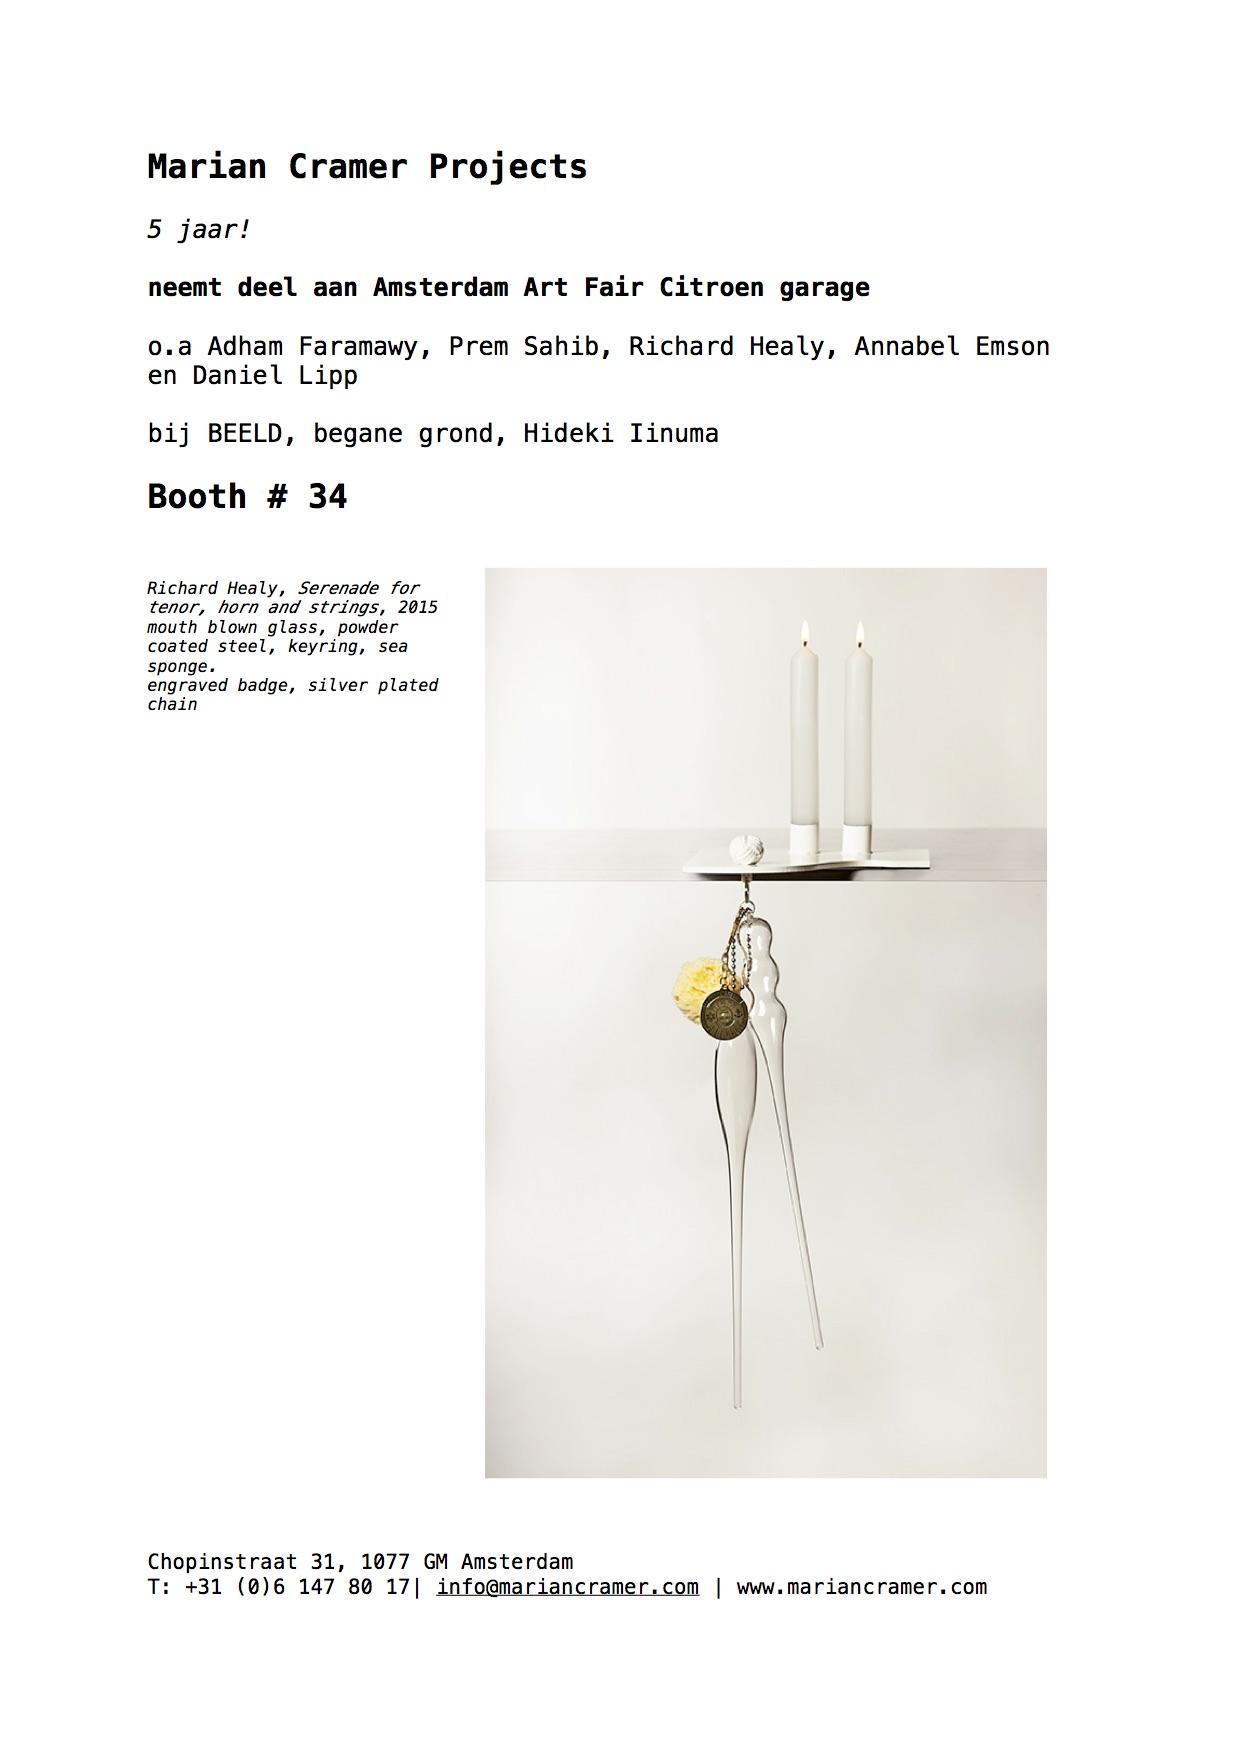 Marian Cramer Projects kopie